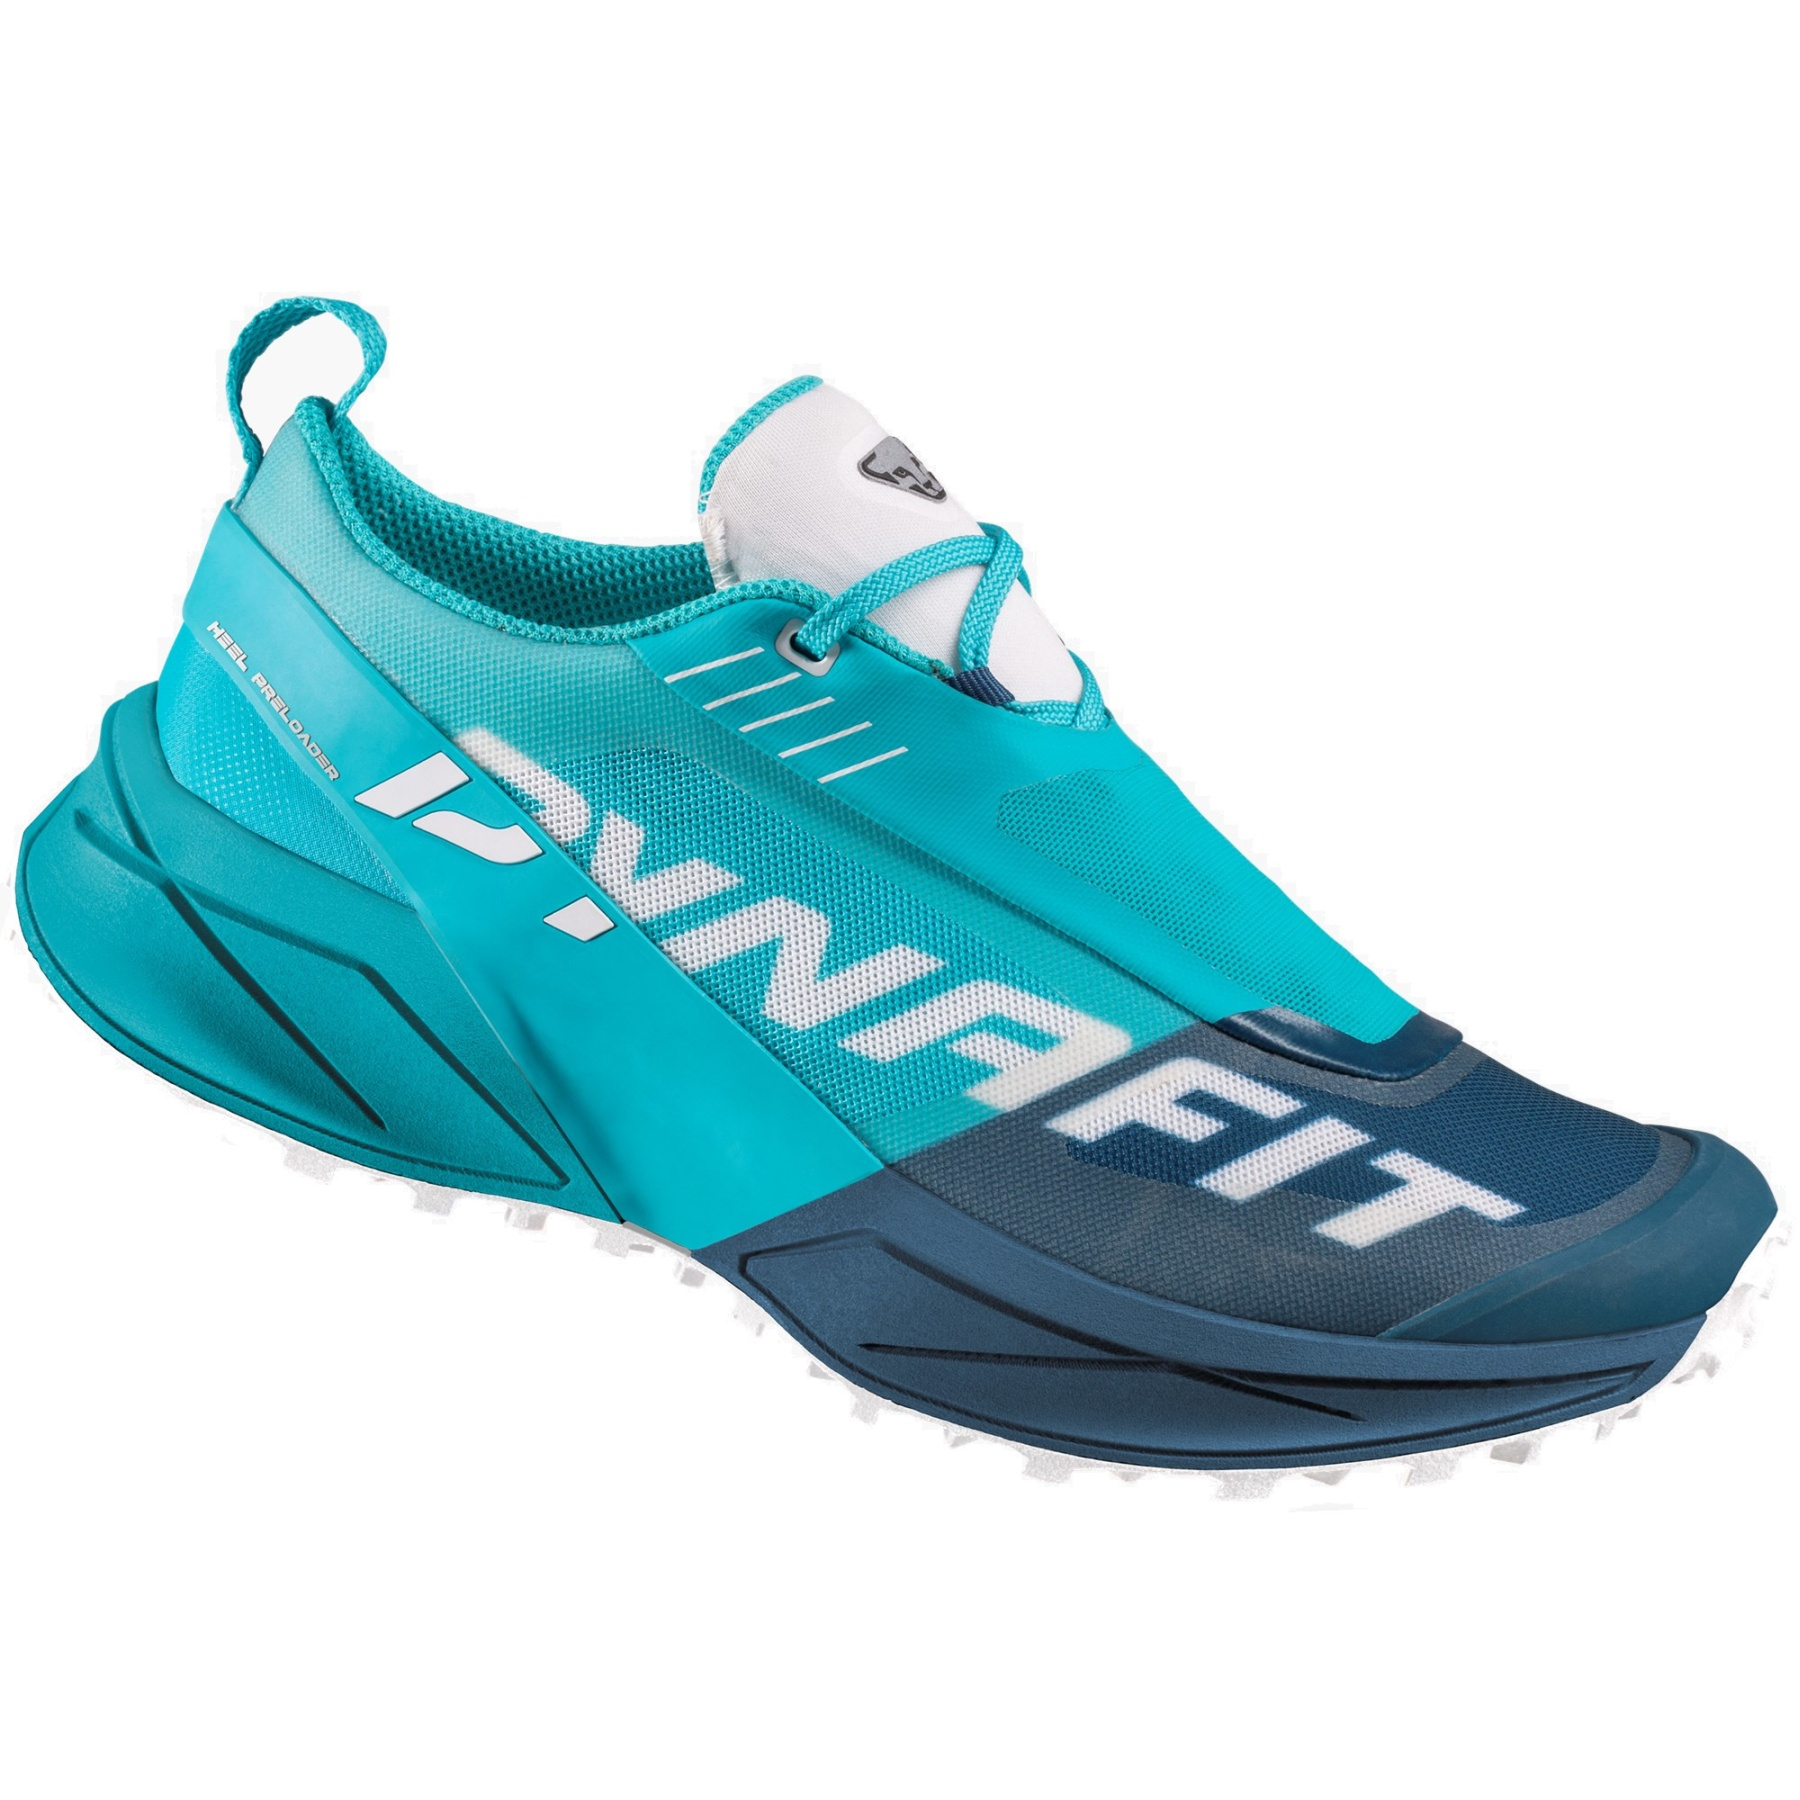 Dynafit Ultra 100 Running Shoes Women - Poseidon/Silvretta